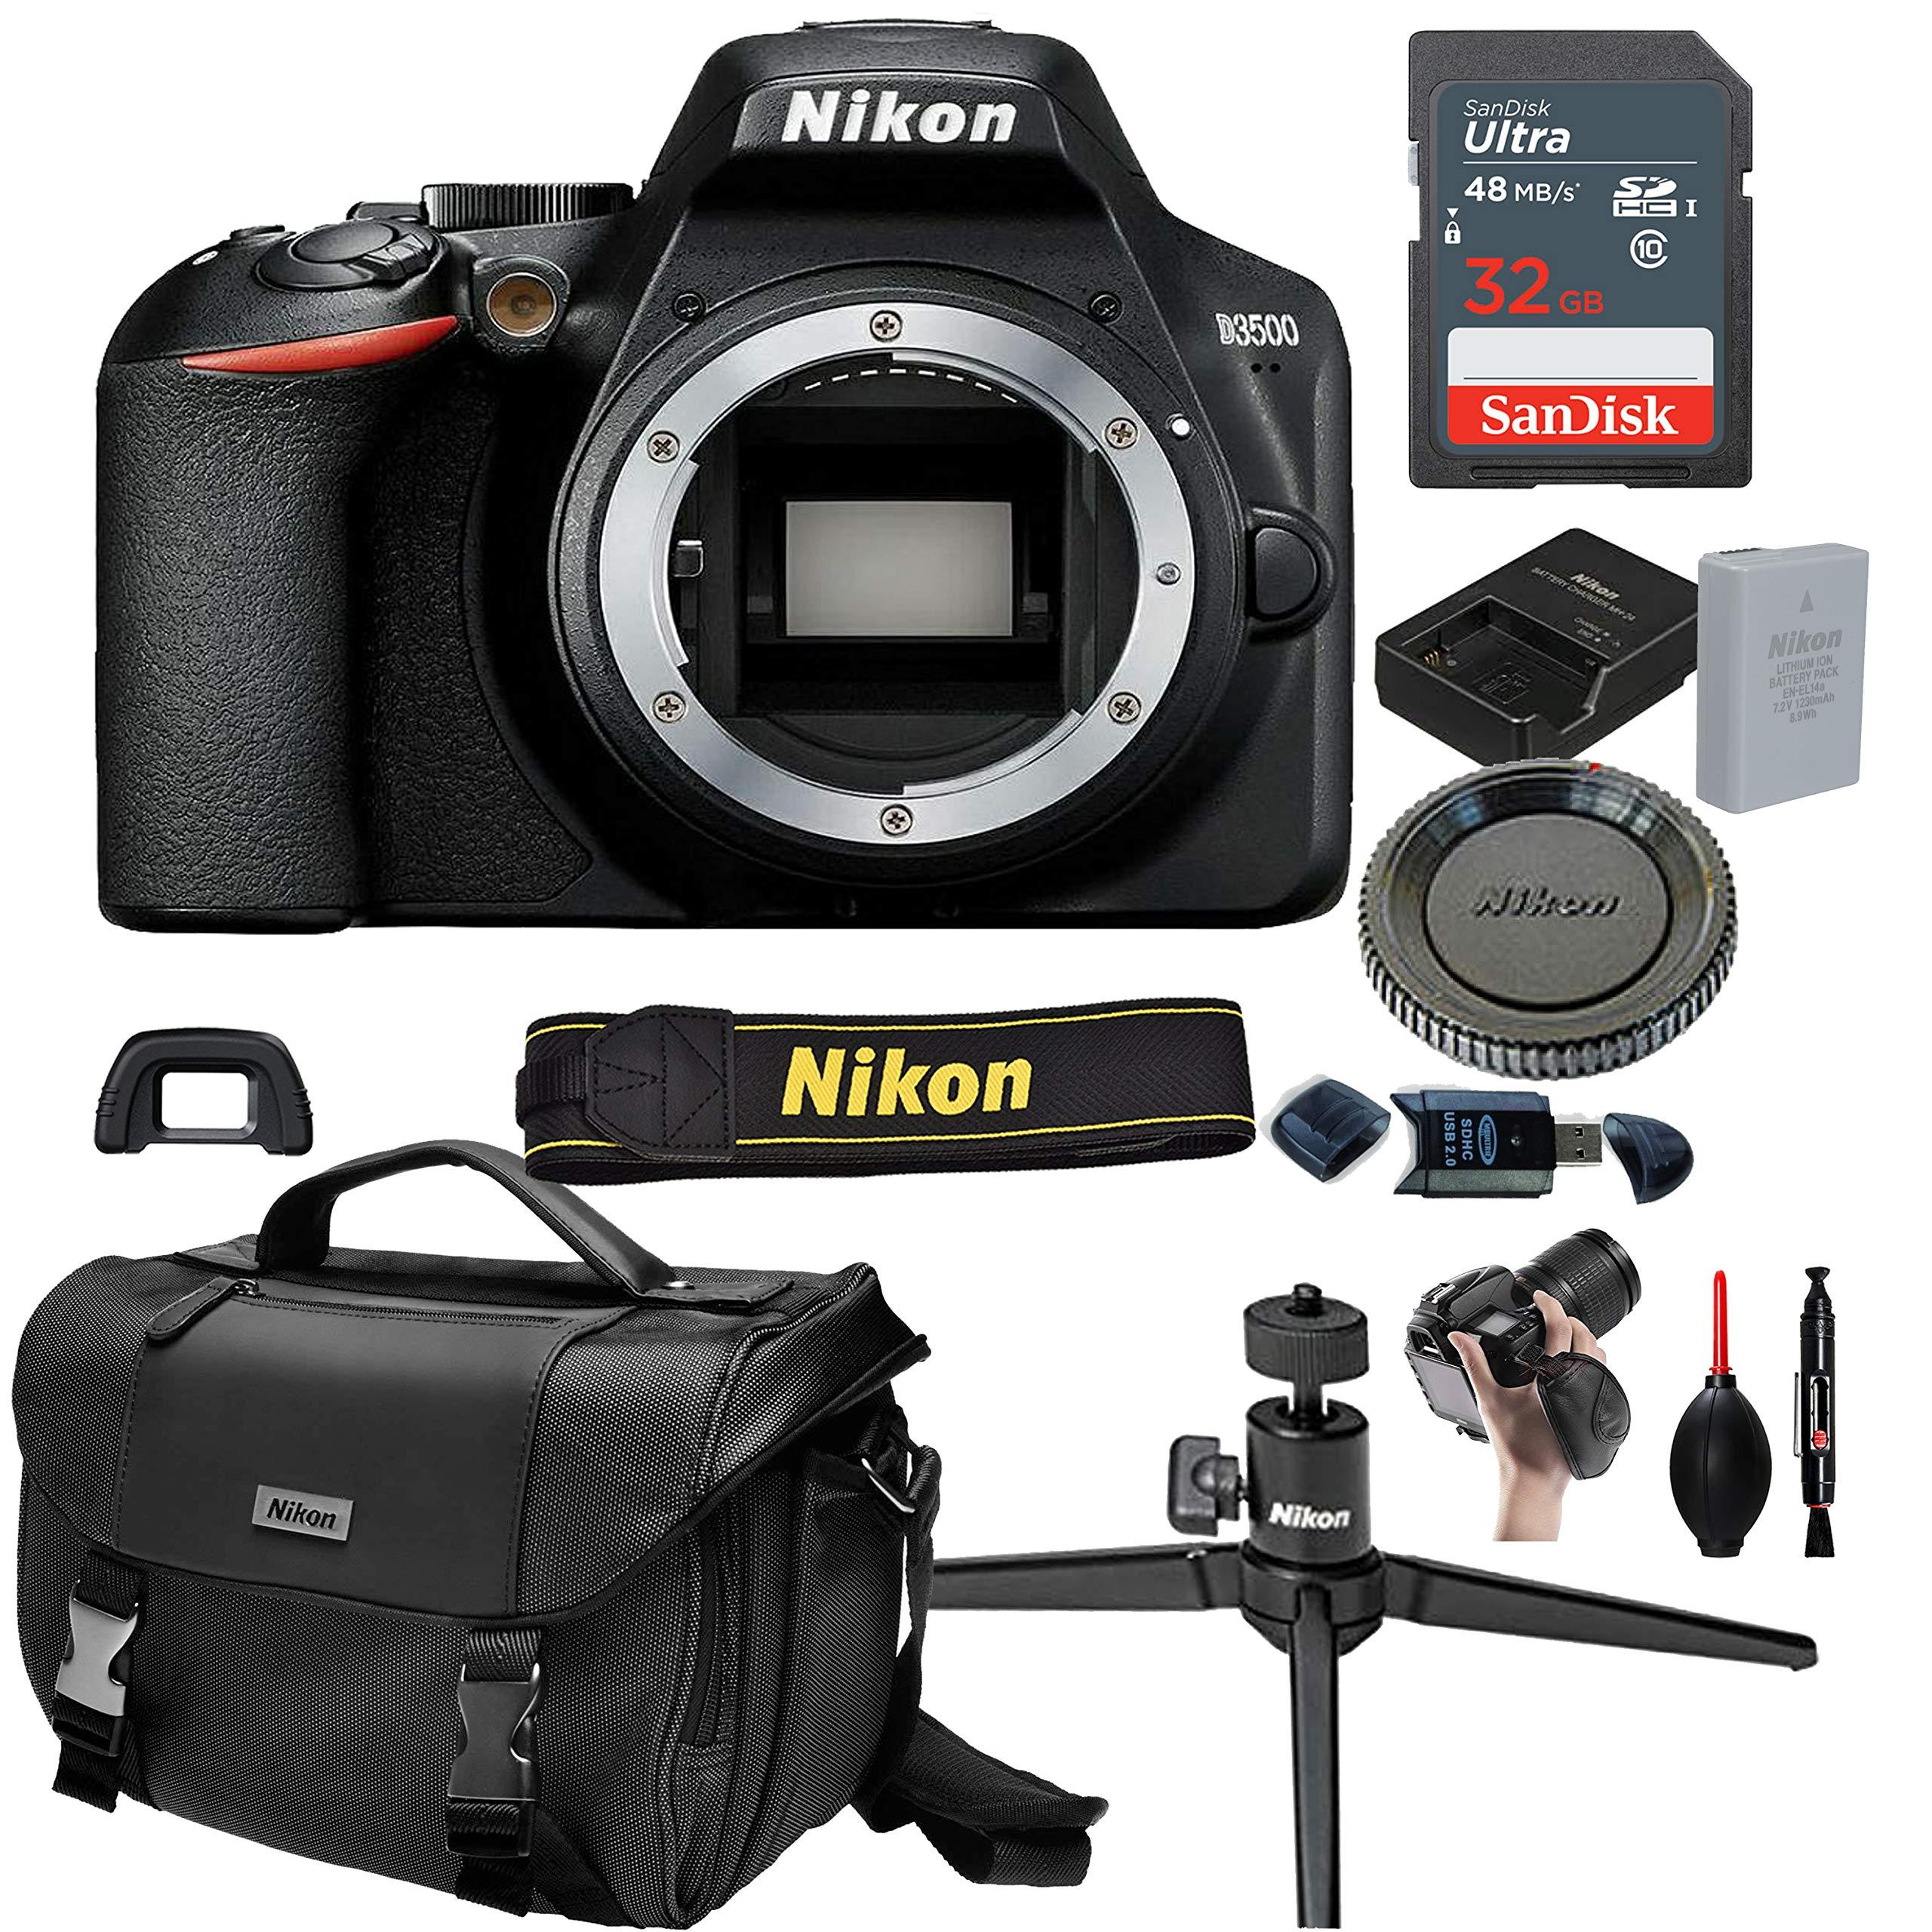 Nikon D3500 DSLR Camera Body (No Lens)+ 32GB Card, Tripod,Case and More (13pc Bundle)